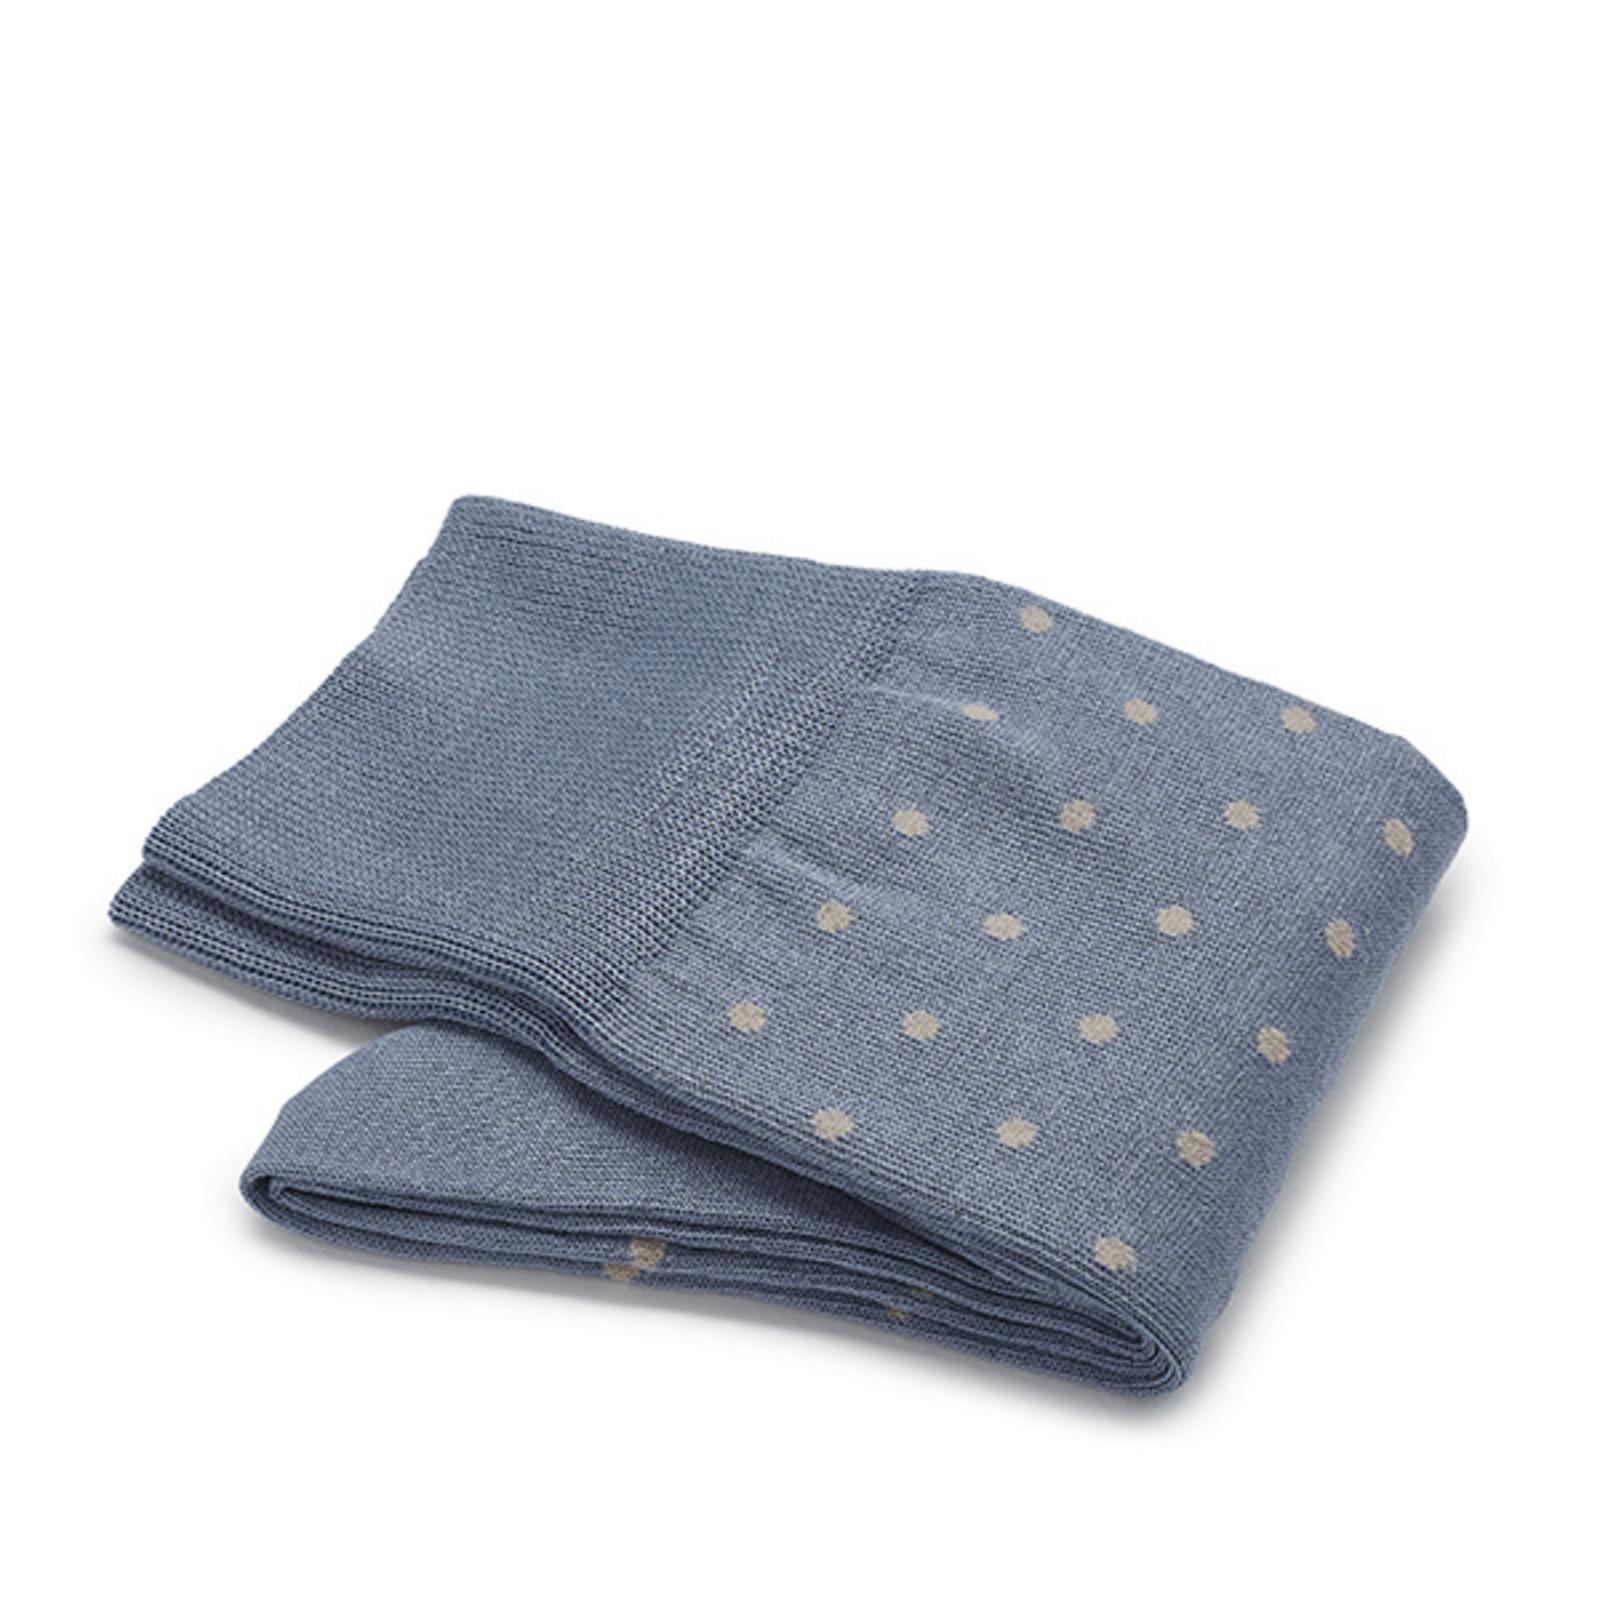 Carlo Lanza Grijs blauwe stip sokken | Carlo Lanza